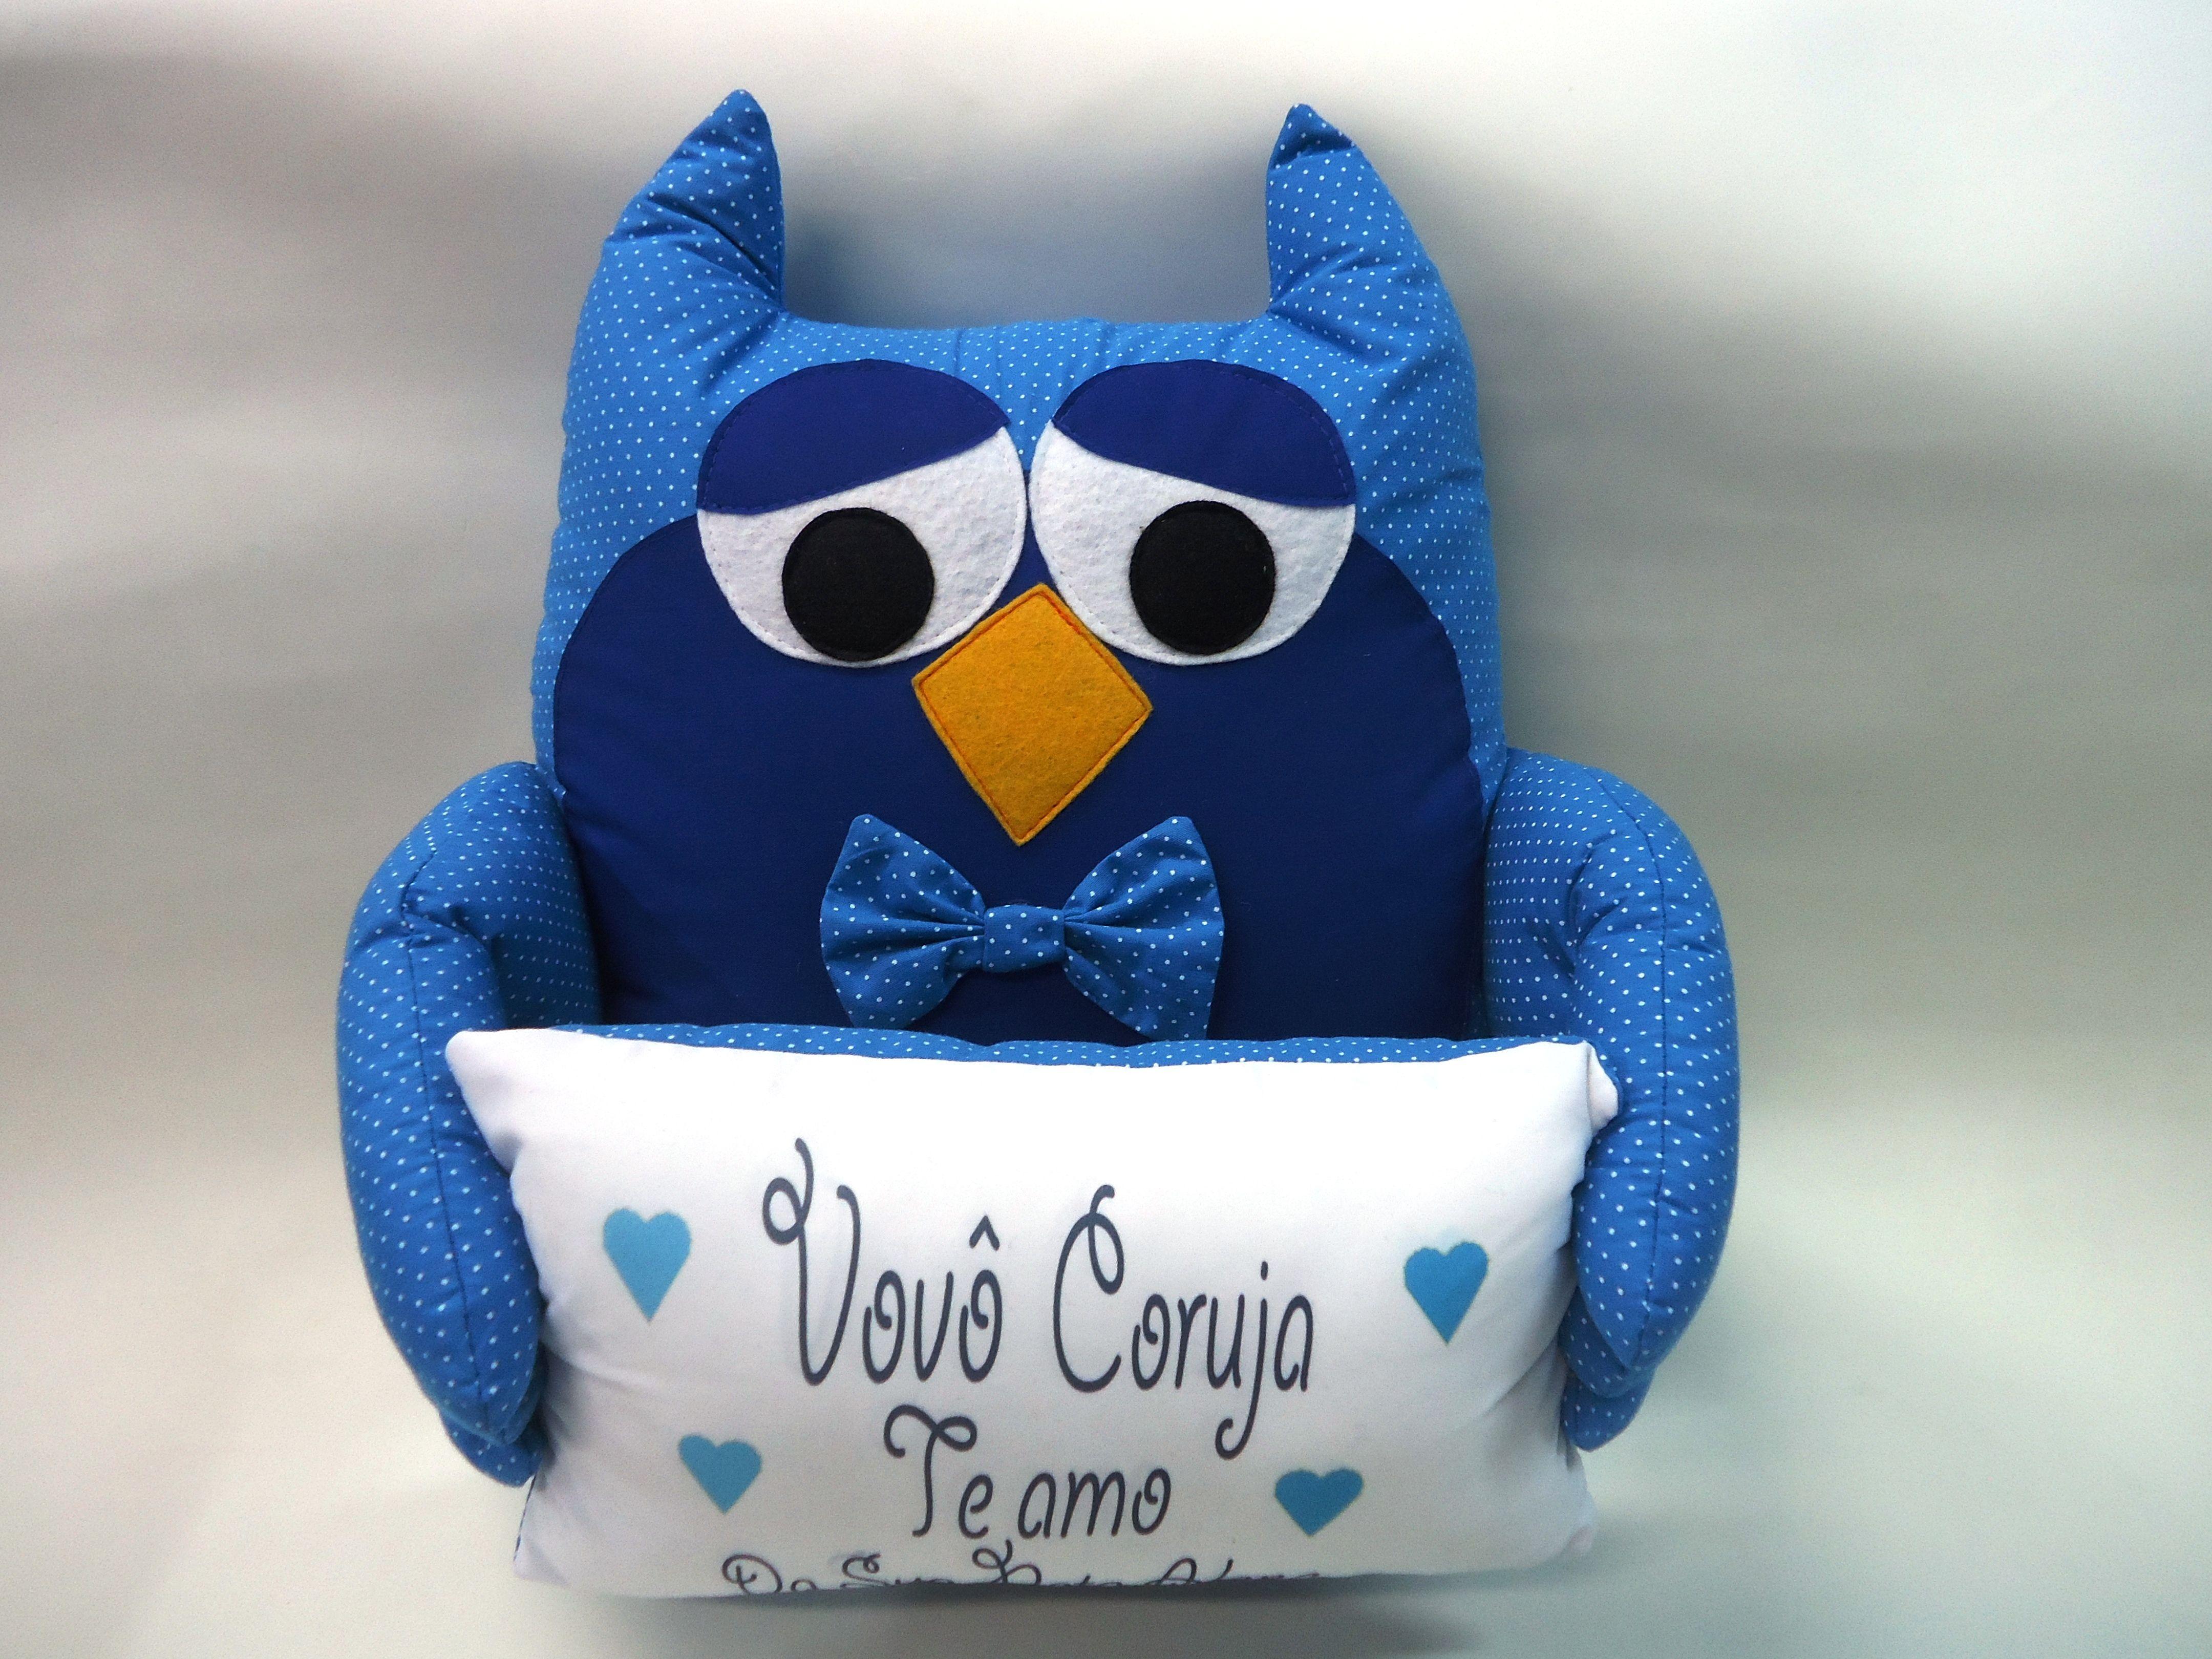 Vovô Coruja www.facebook.com/mundodoaconchego